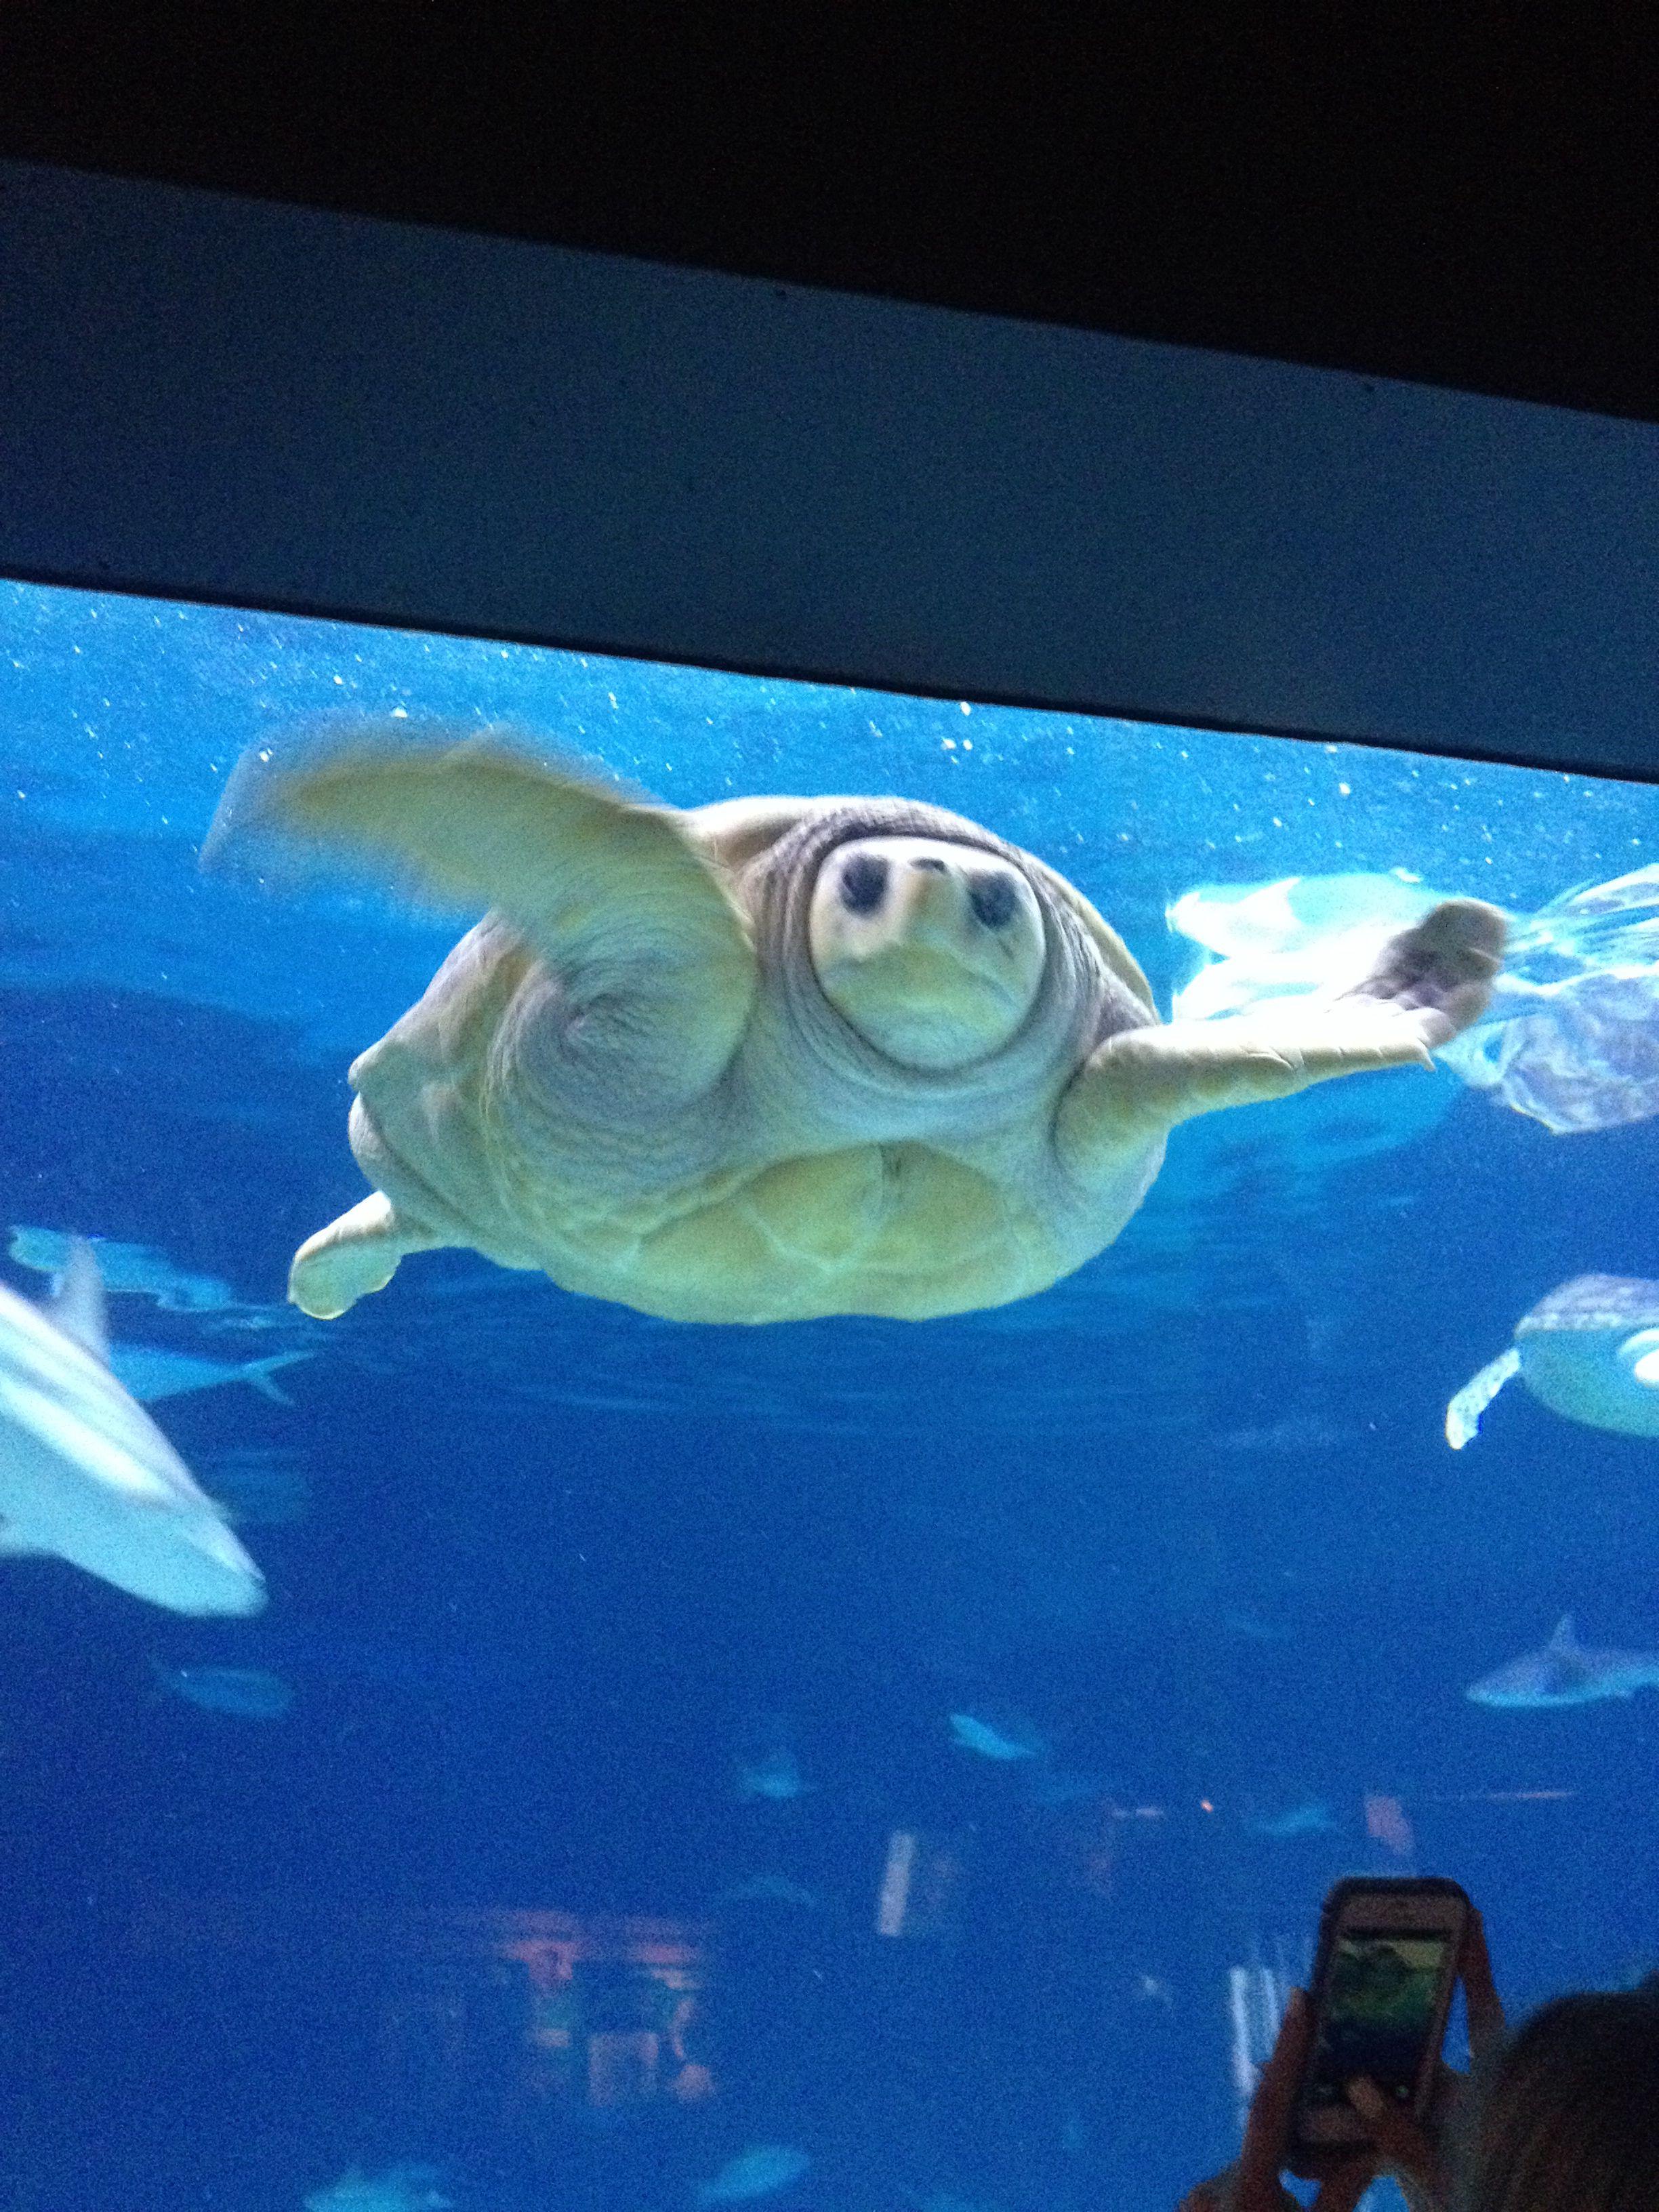 Pin on Amazing Aquariums